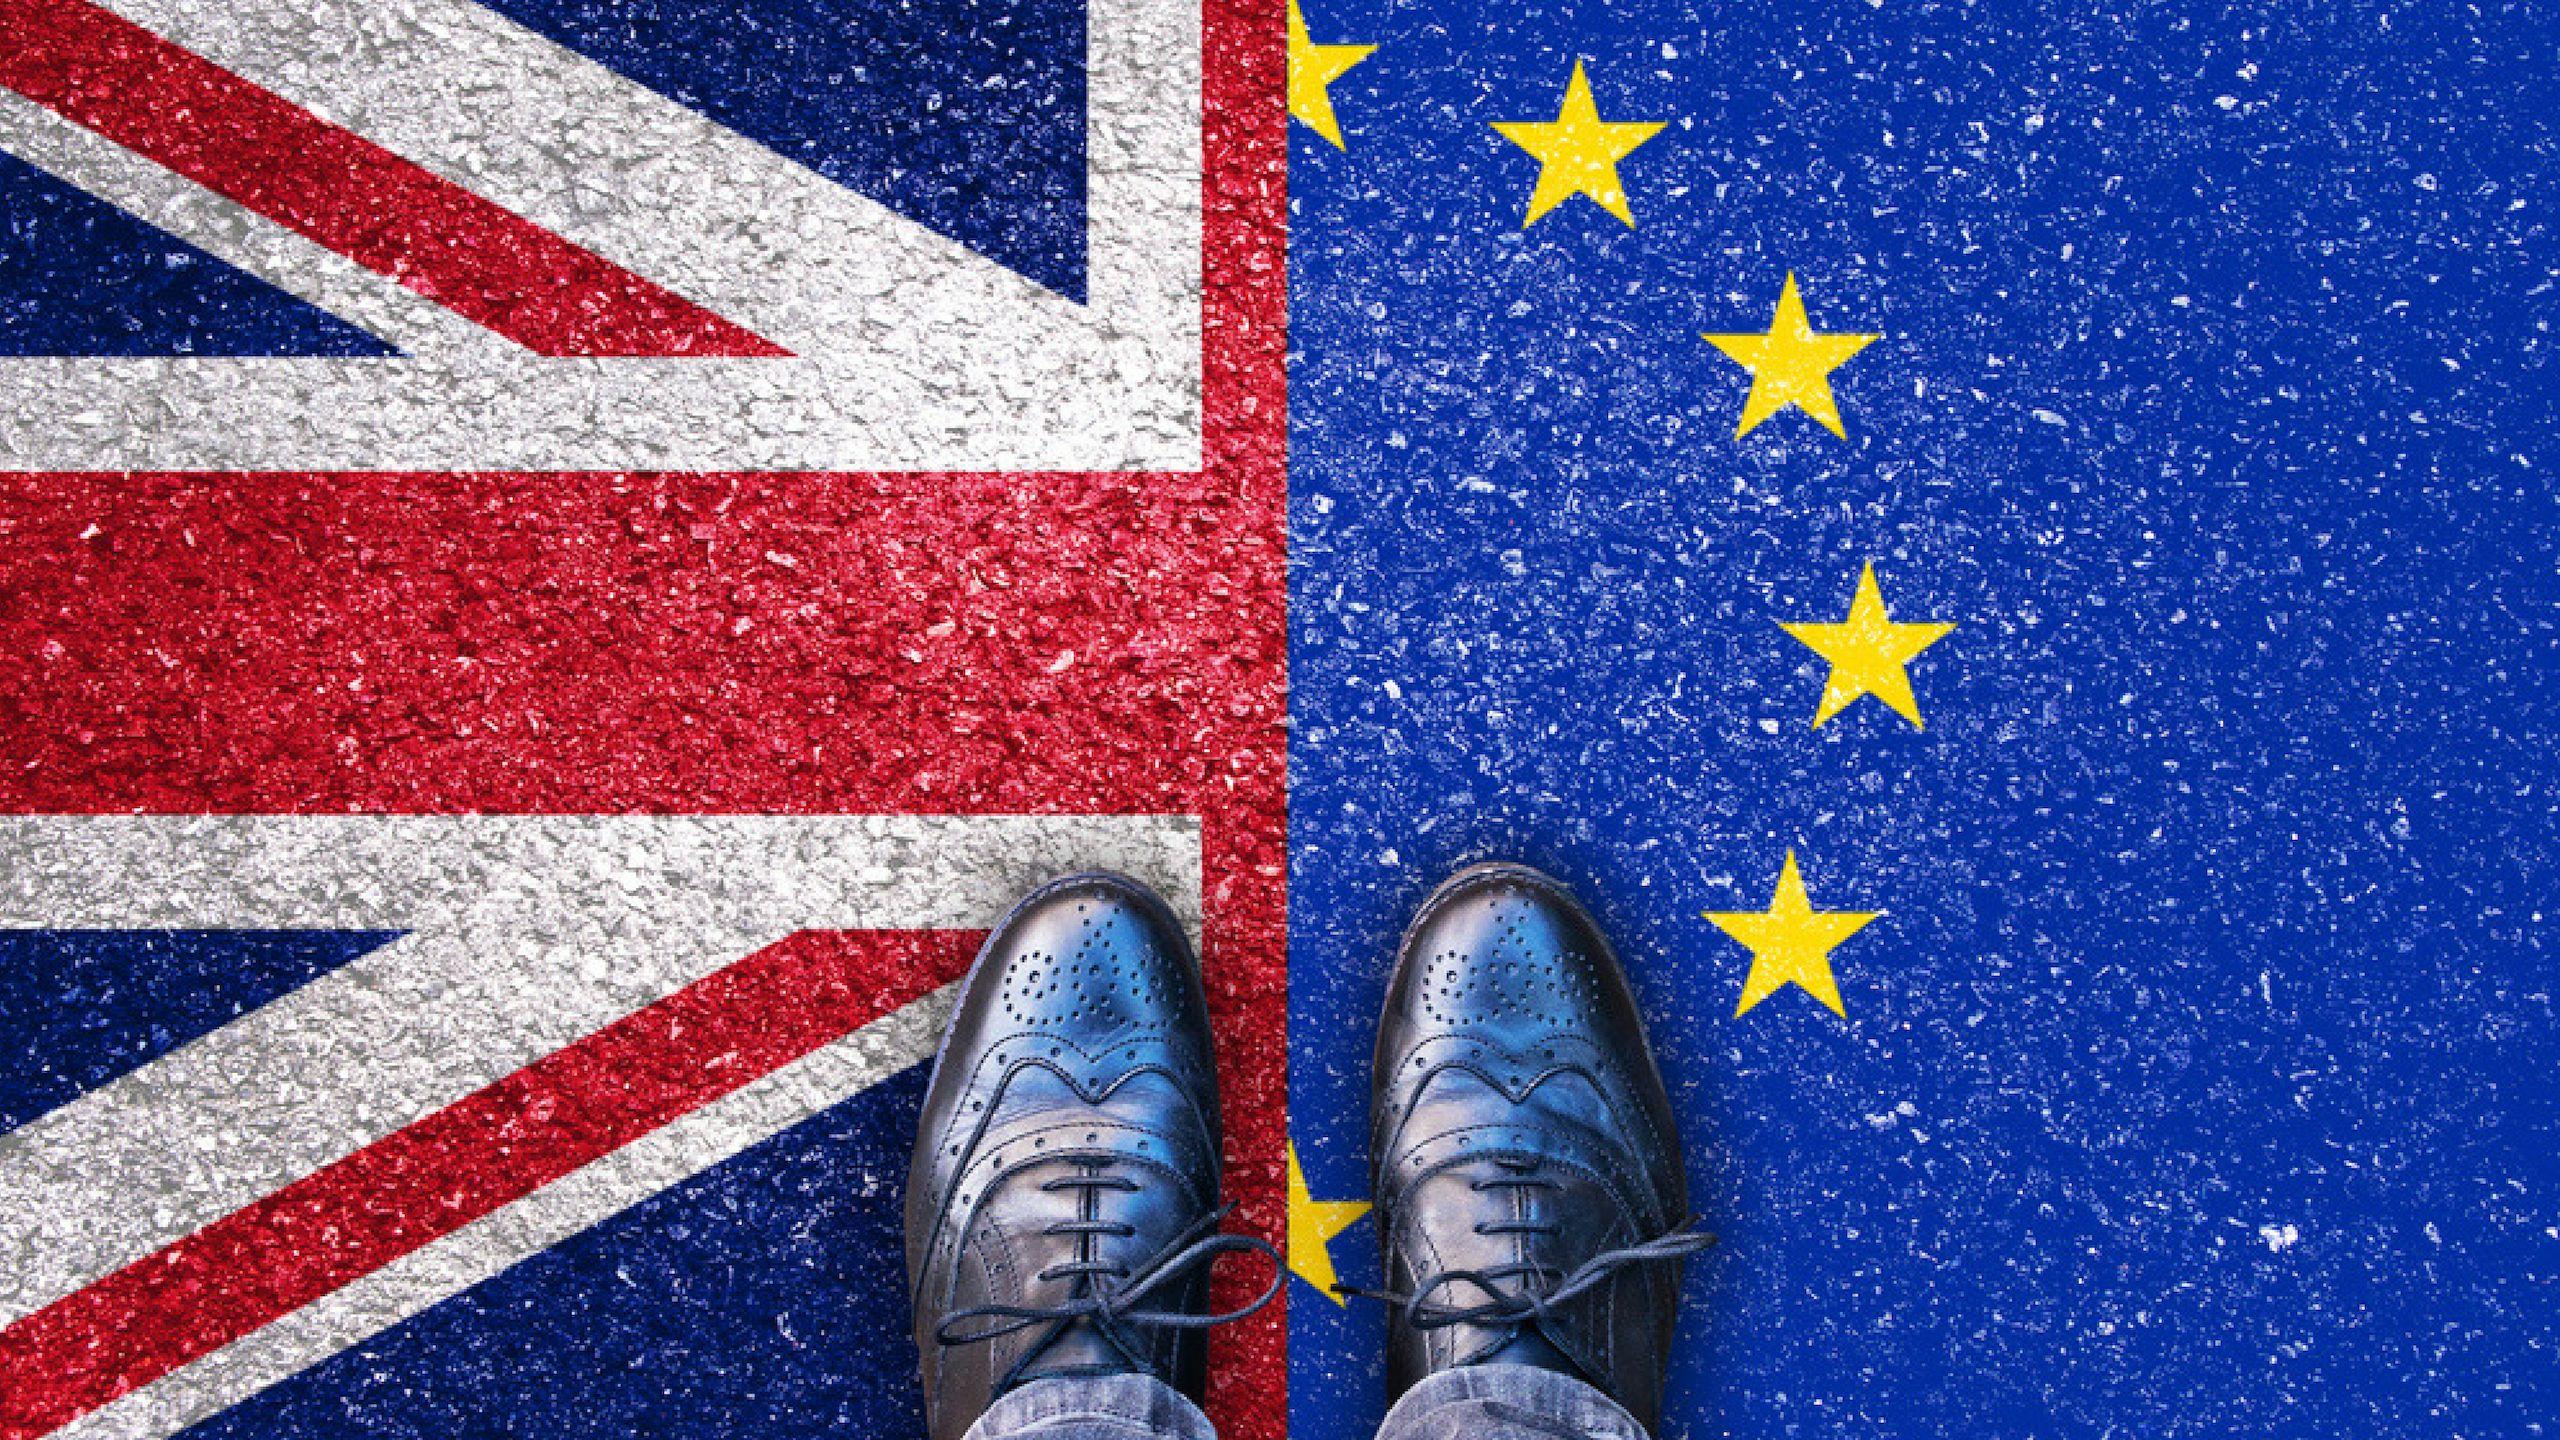 Joint flag feet1 Brexit, Bitcoin transaction, Bitcoin